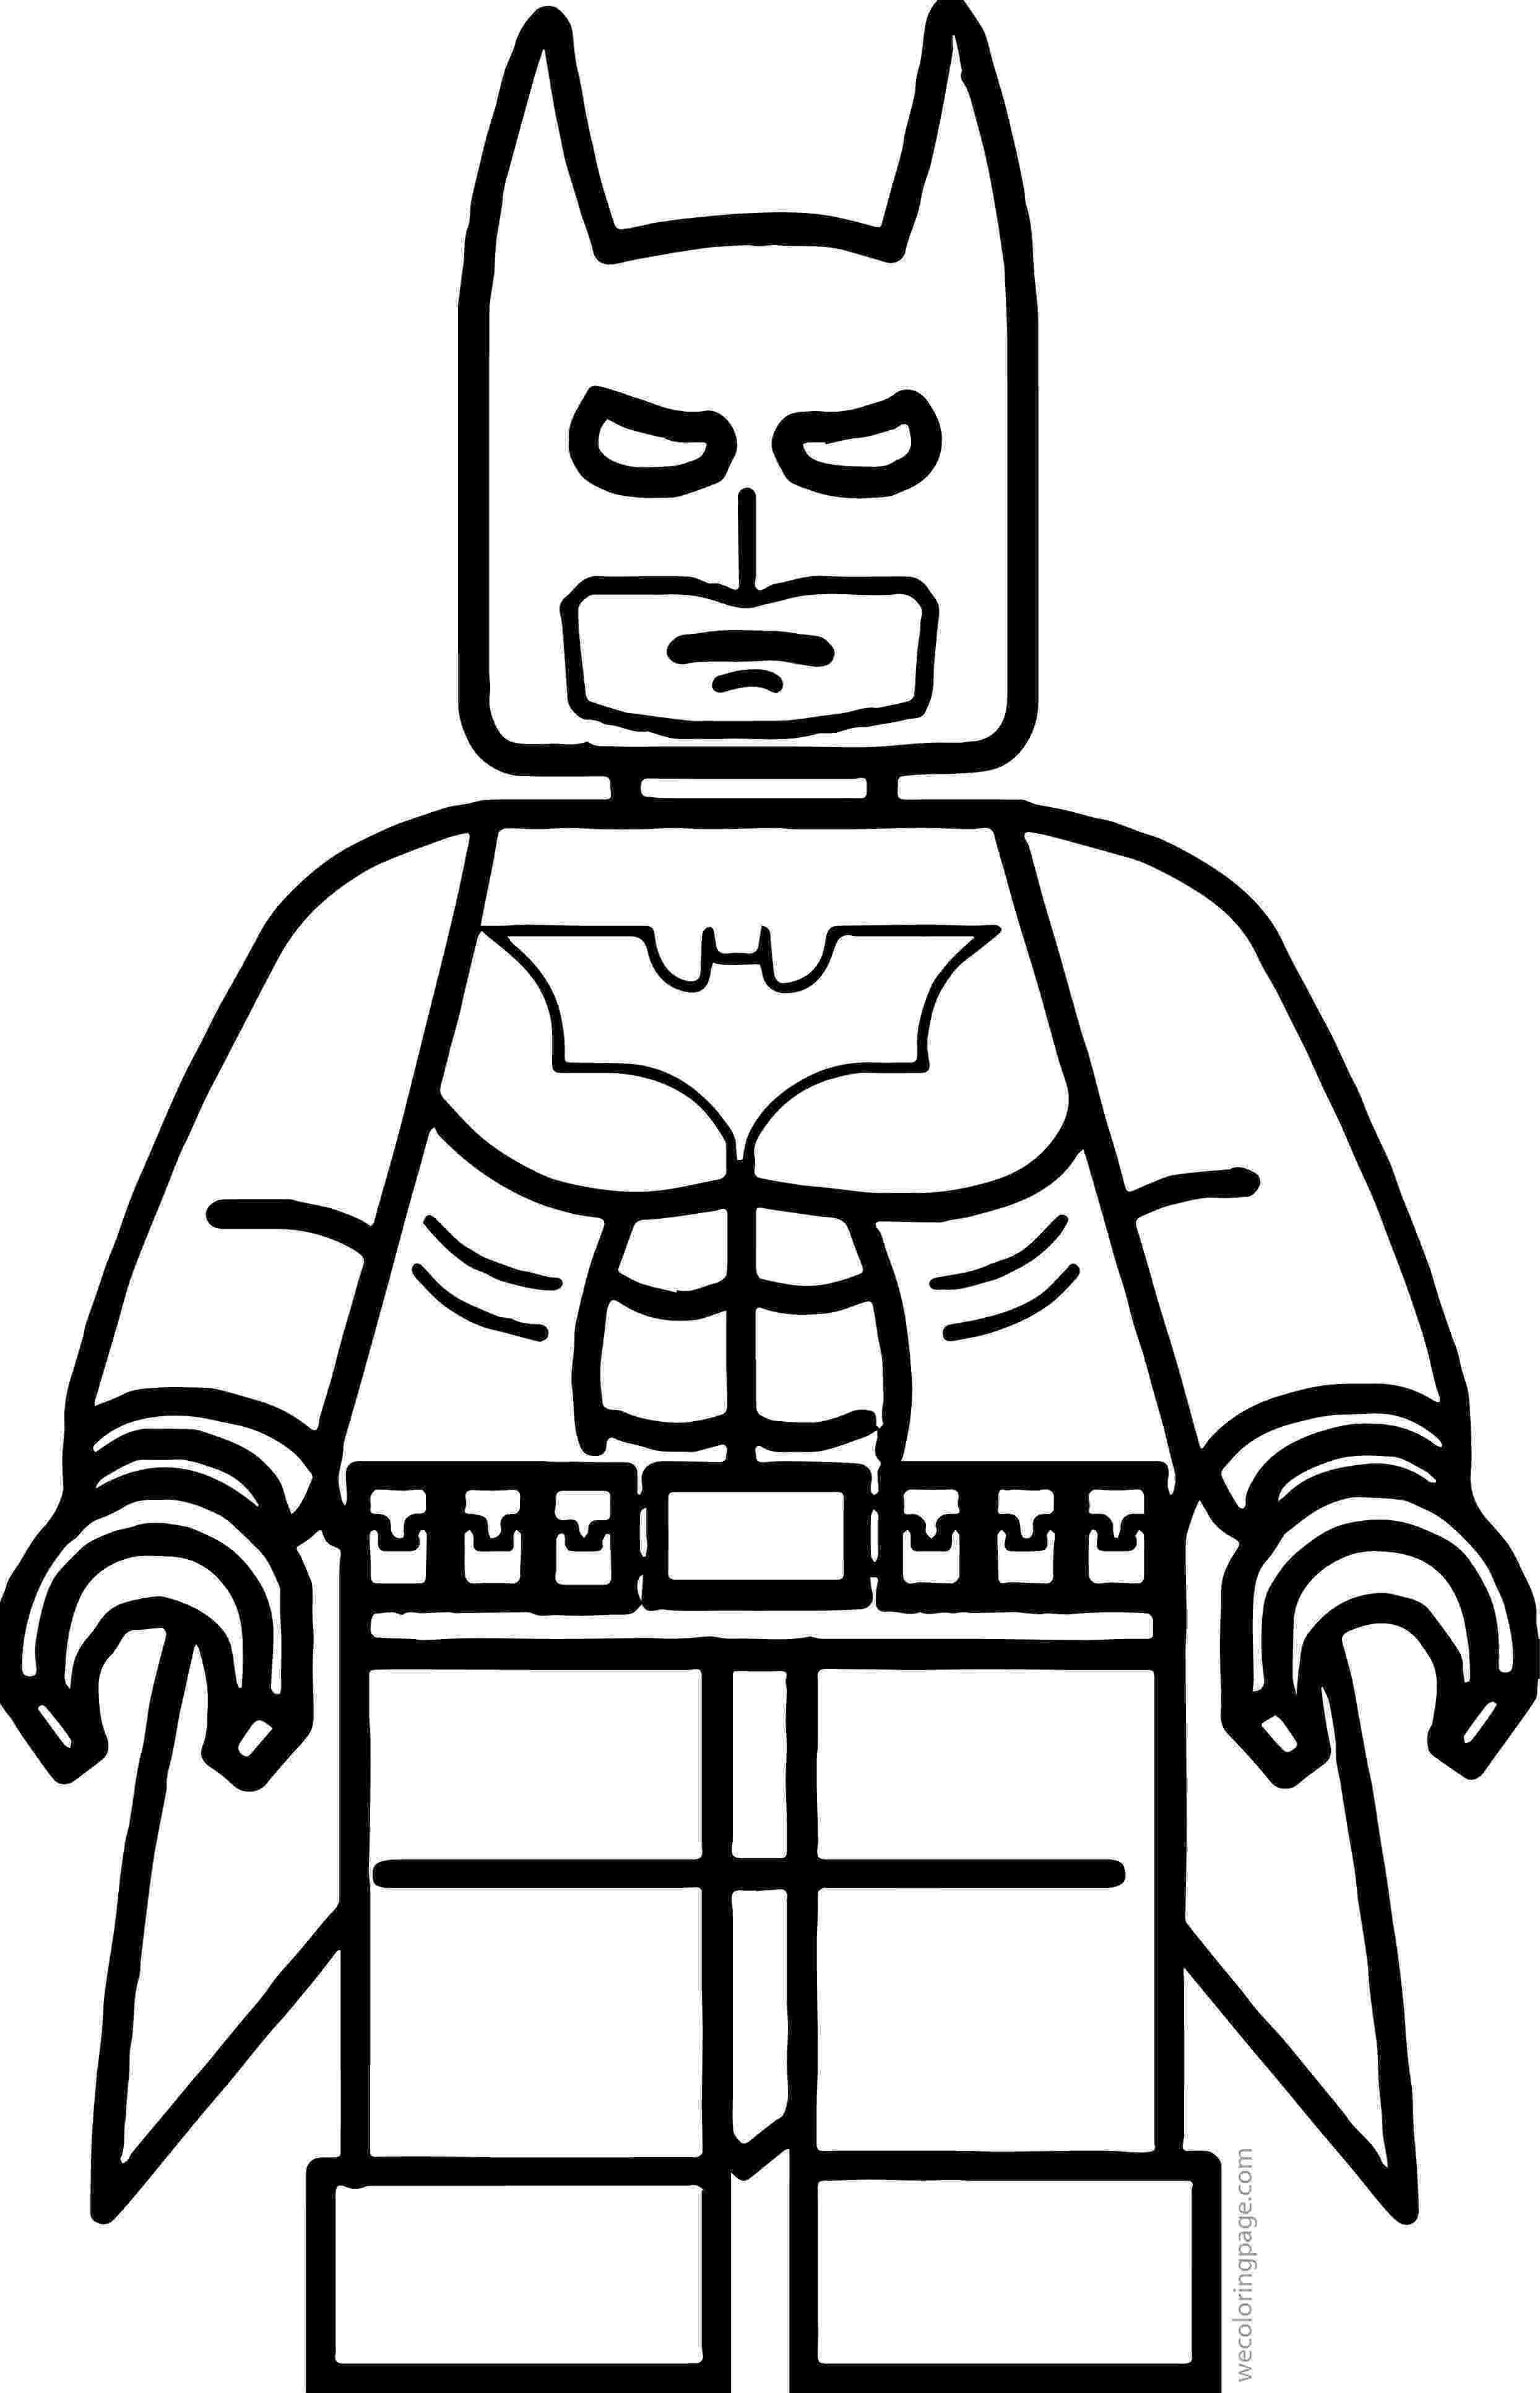 lego batman pictures to colour lego batman to color for kids lego batman kids coloring pictures batman to colour lego